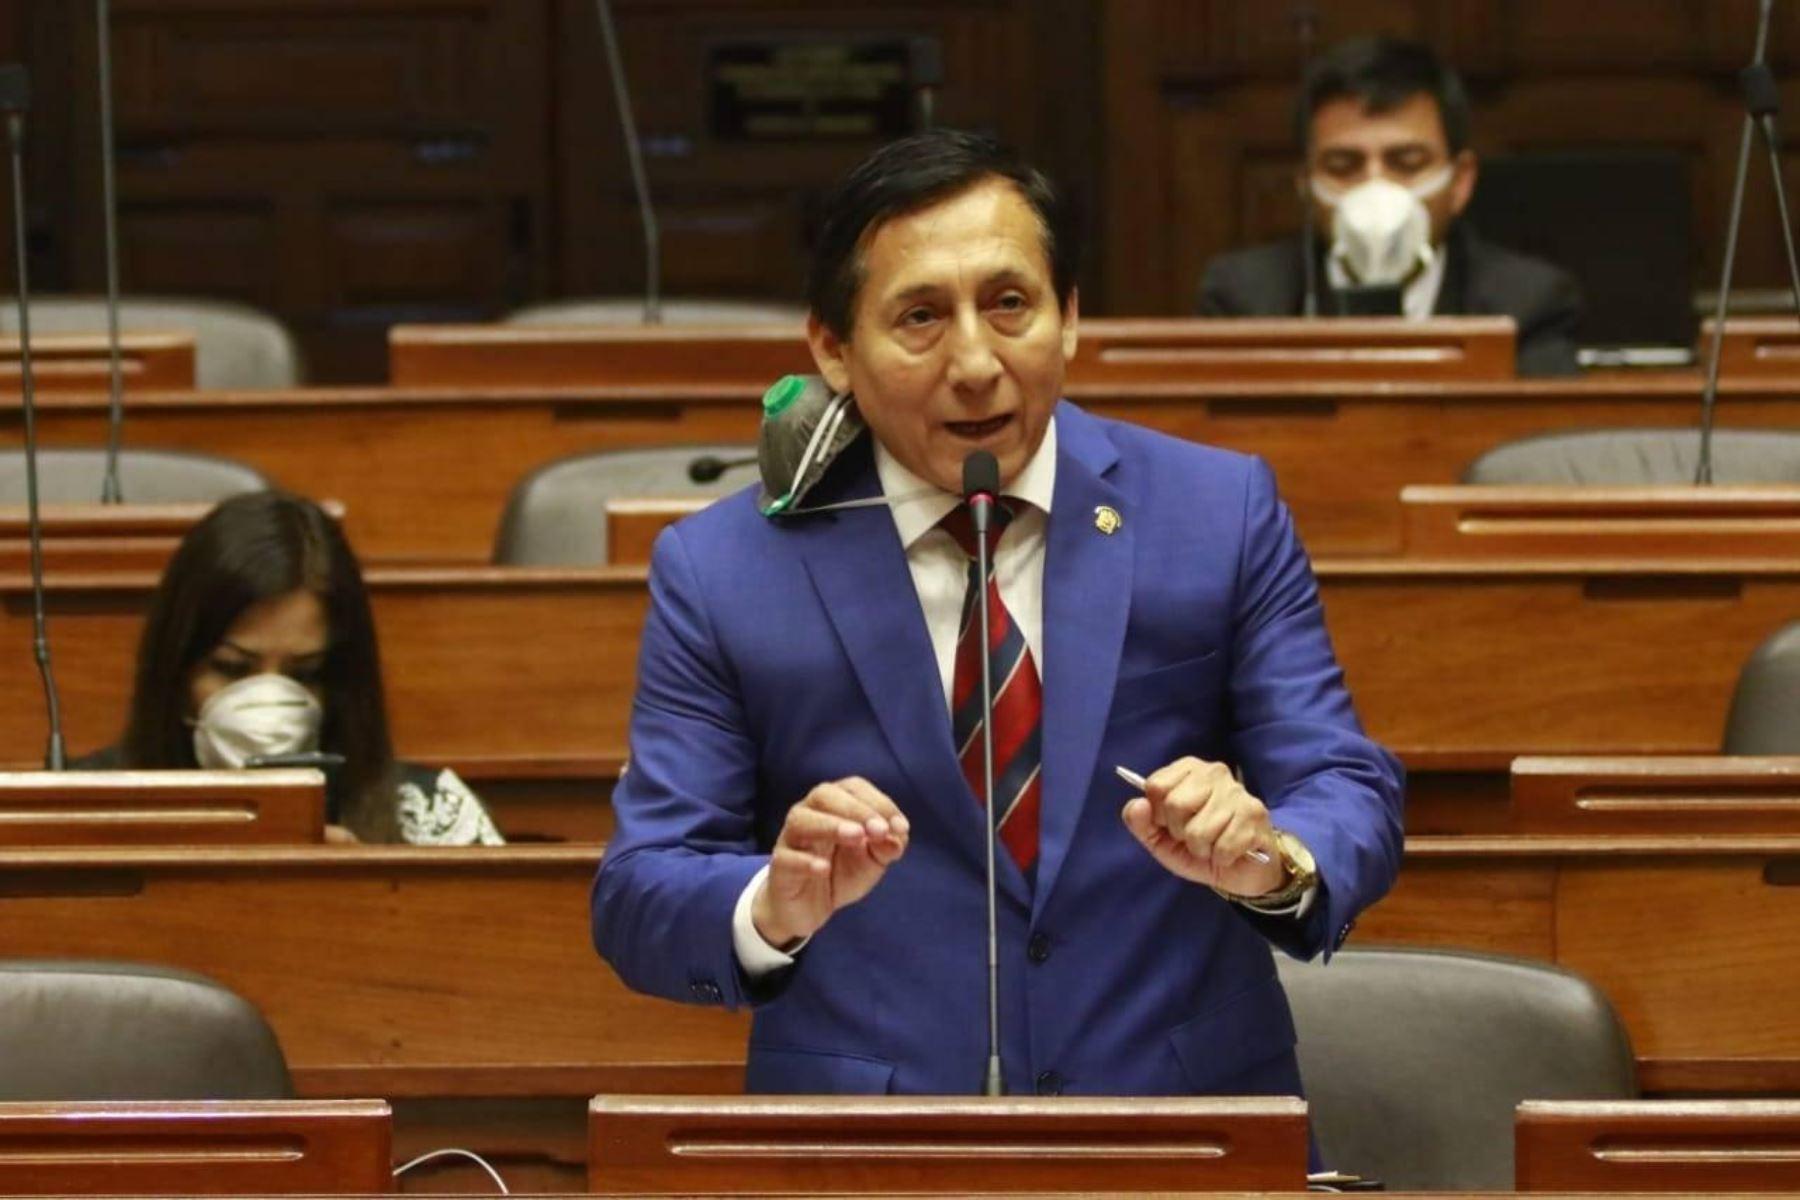 Congresista Carlos Almerí. Foto: ANDINA/difusión.